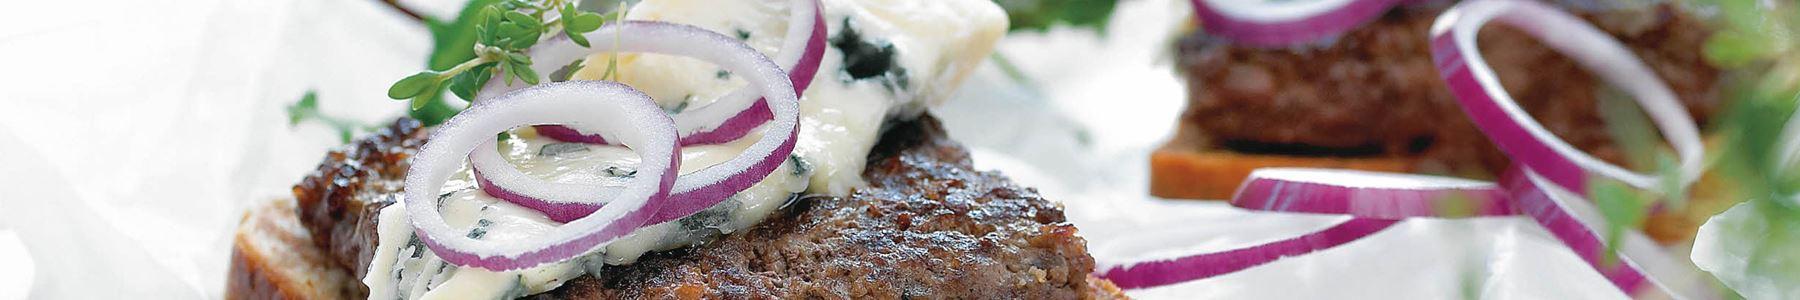 Okse + Smørrebrød